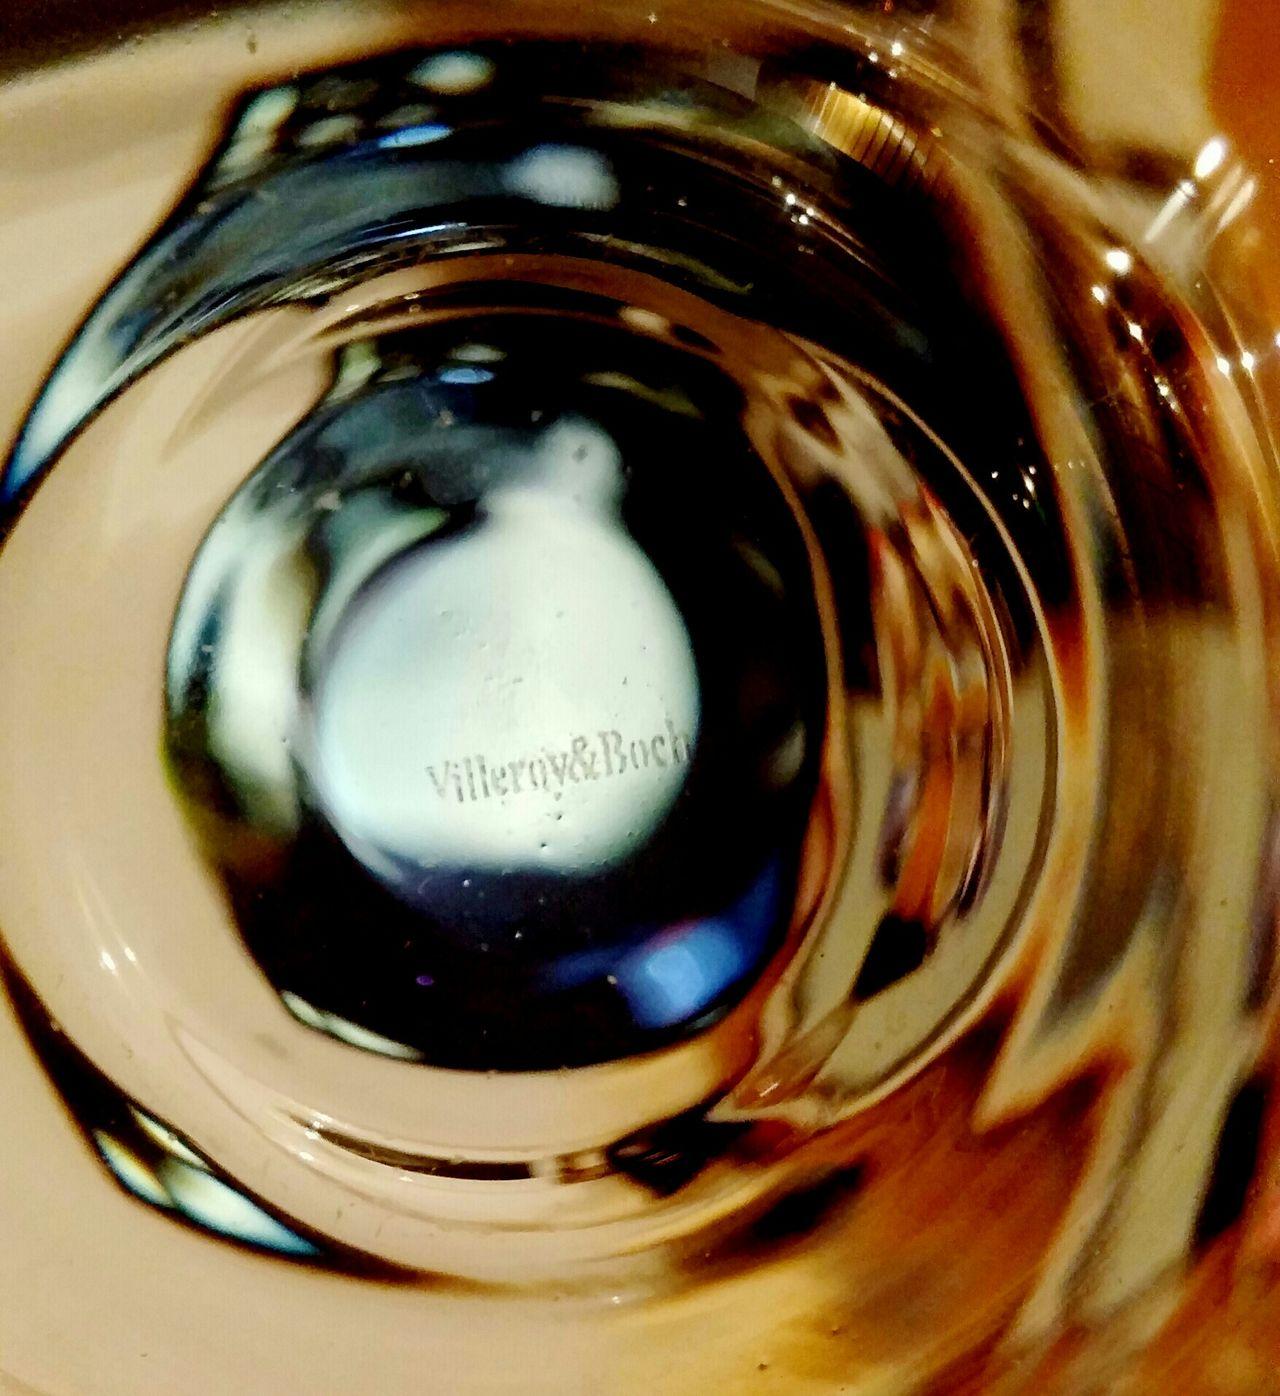 Villeroyandboch At The Bottom Of The Glass